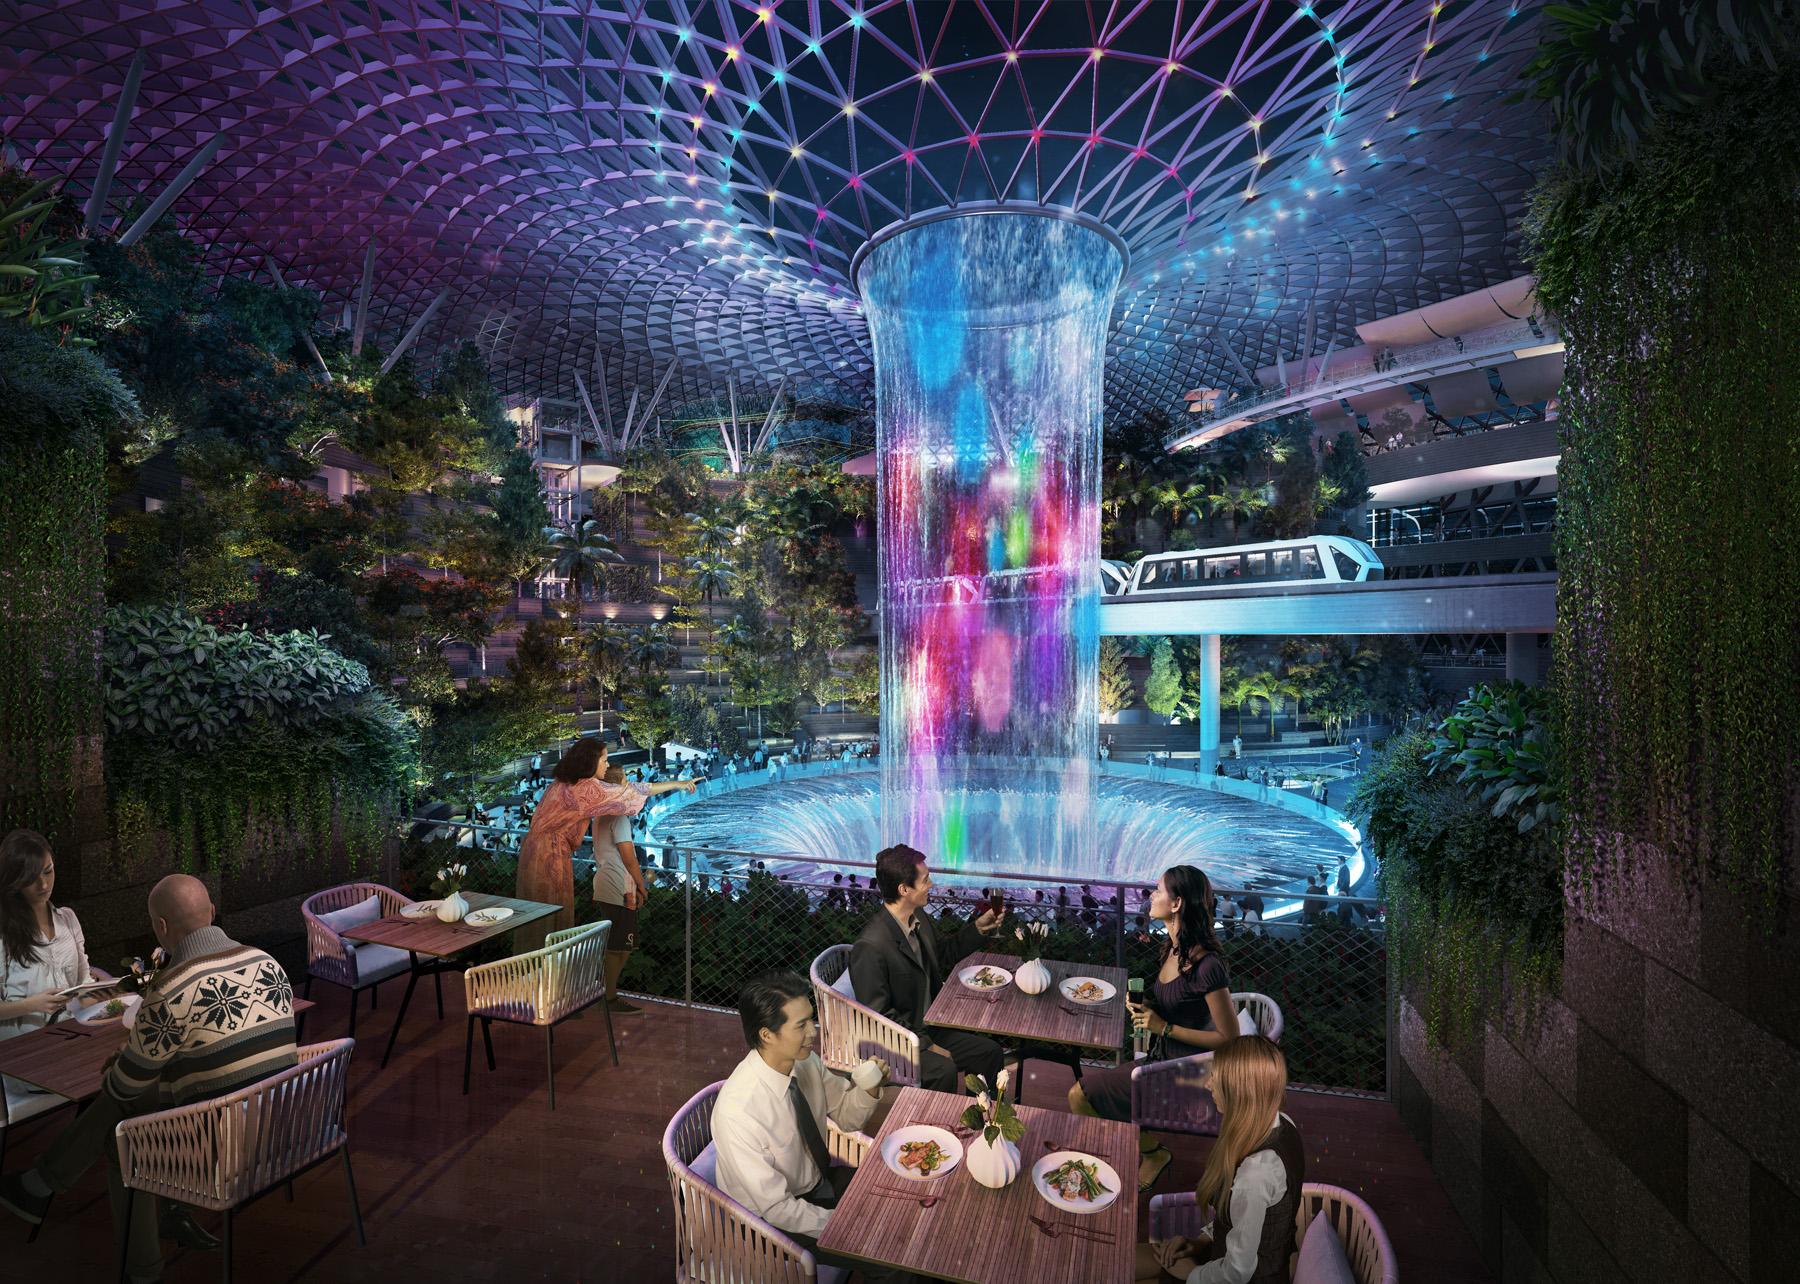 Stunning pre-flight dining options at Changi's Jewel